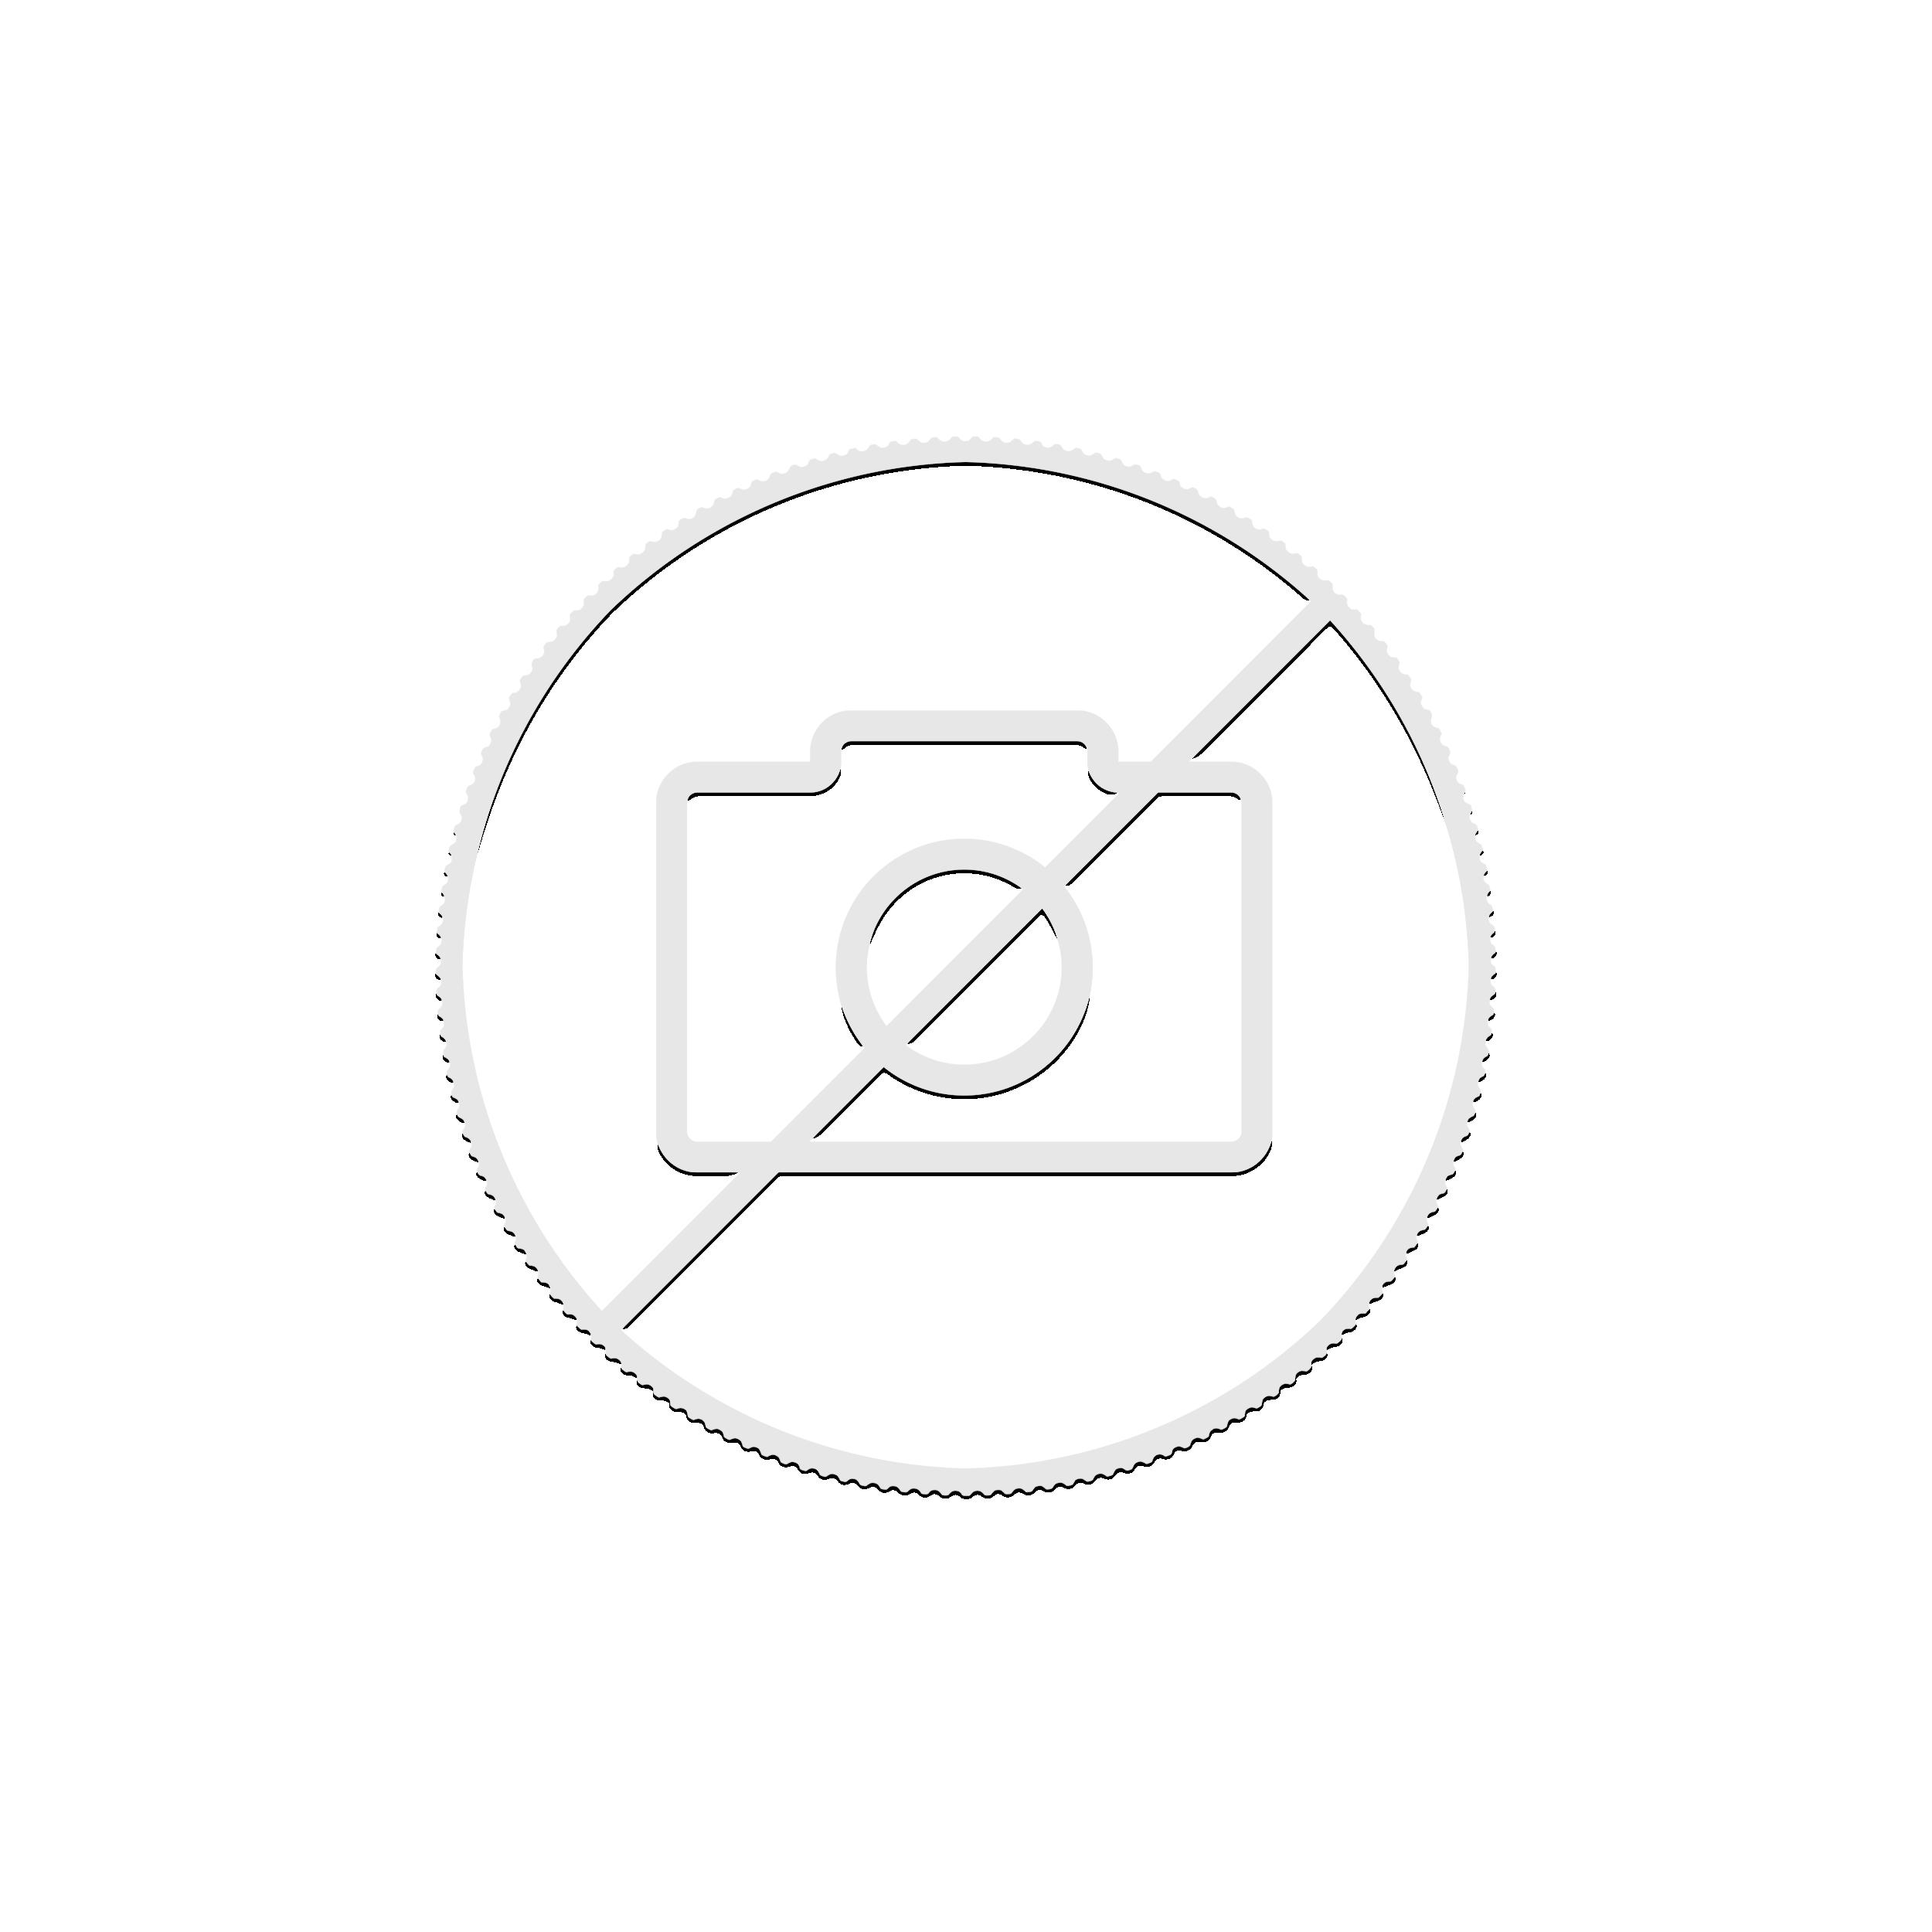 1 troy ounce silver coin Mexican Libertad